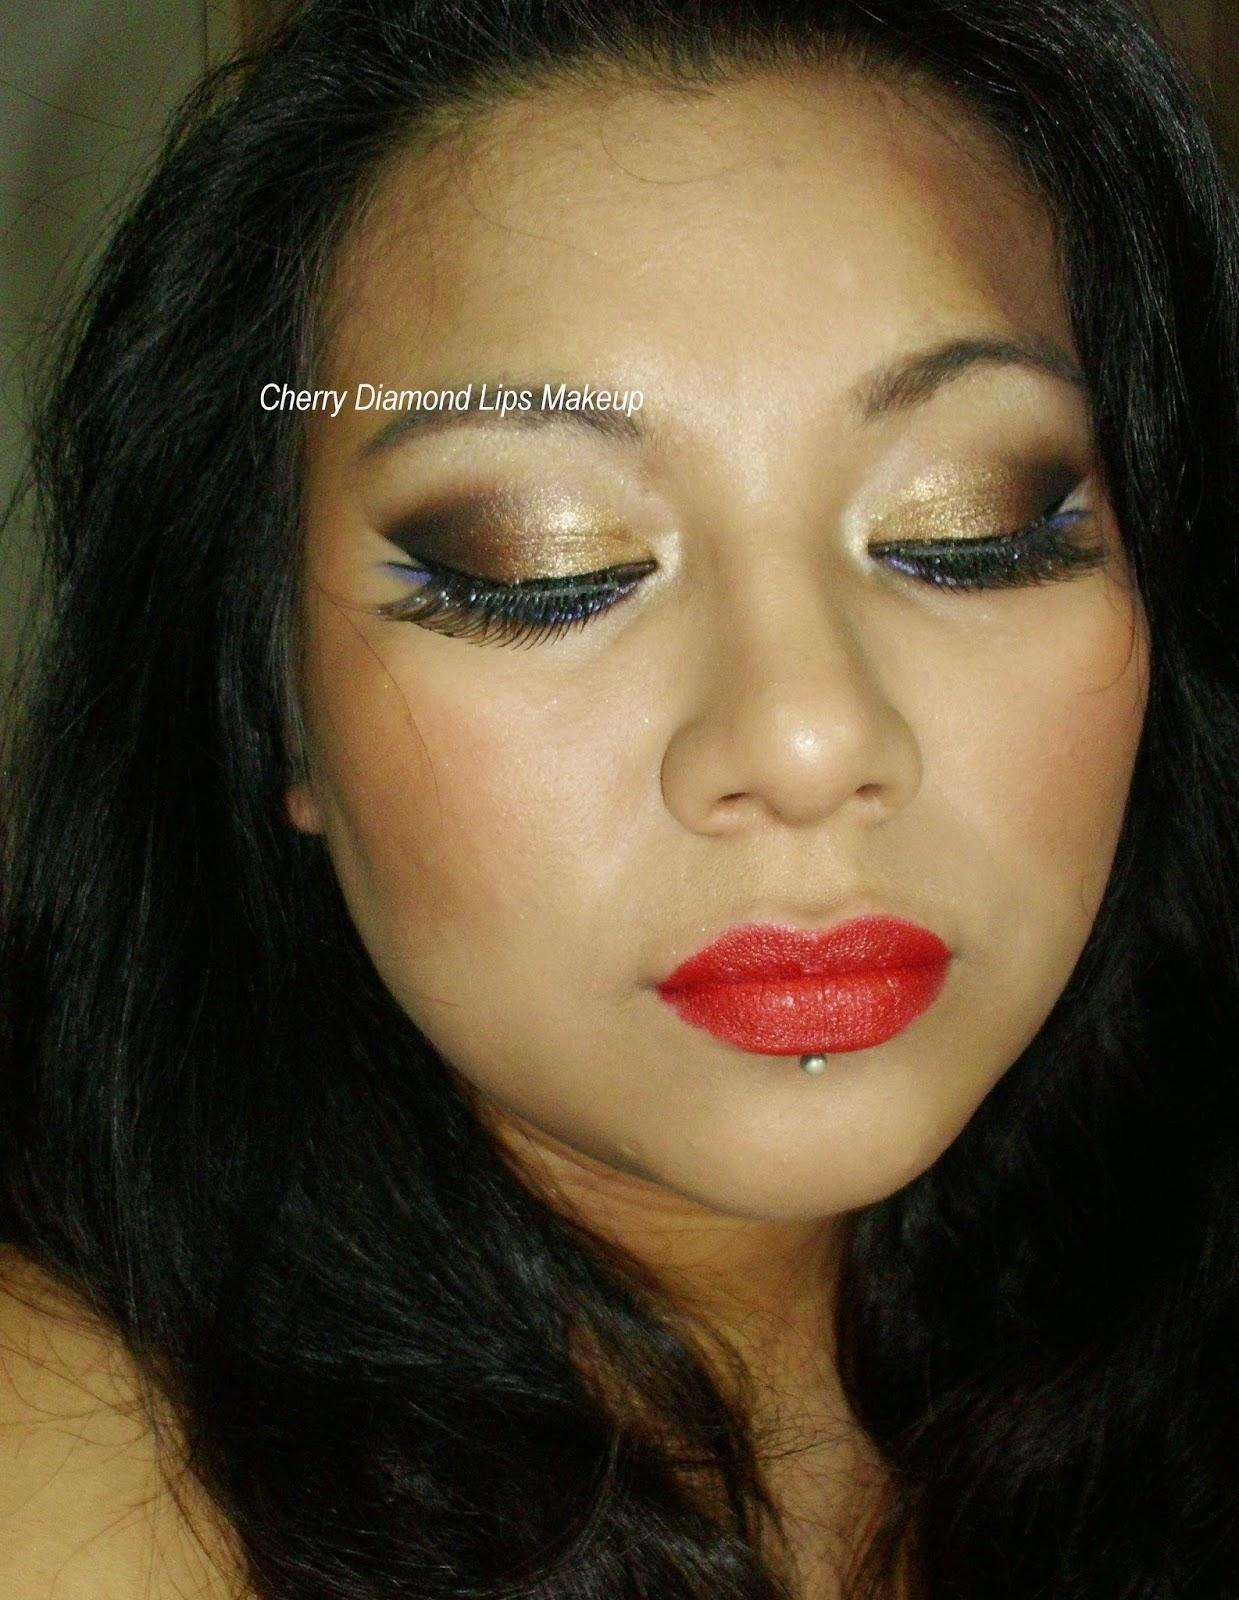 Cherry Diamond Lips Makeup, Naked 2, Black Out, Urban Decay, Versailles, Neve Cosmetics, Half baked, heave&Earth, Makeup Academy, MUA, Lock&Load, Makeup Revolution, Glitz, Nabla, Essence, Catrice, Debby, 68 Moulin Rouge